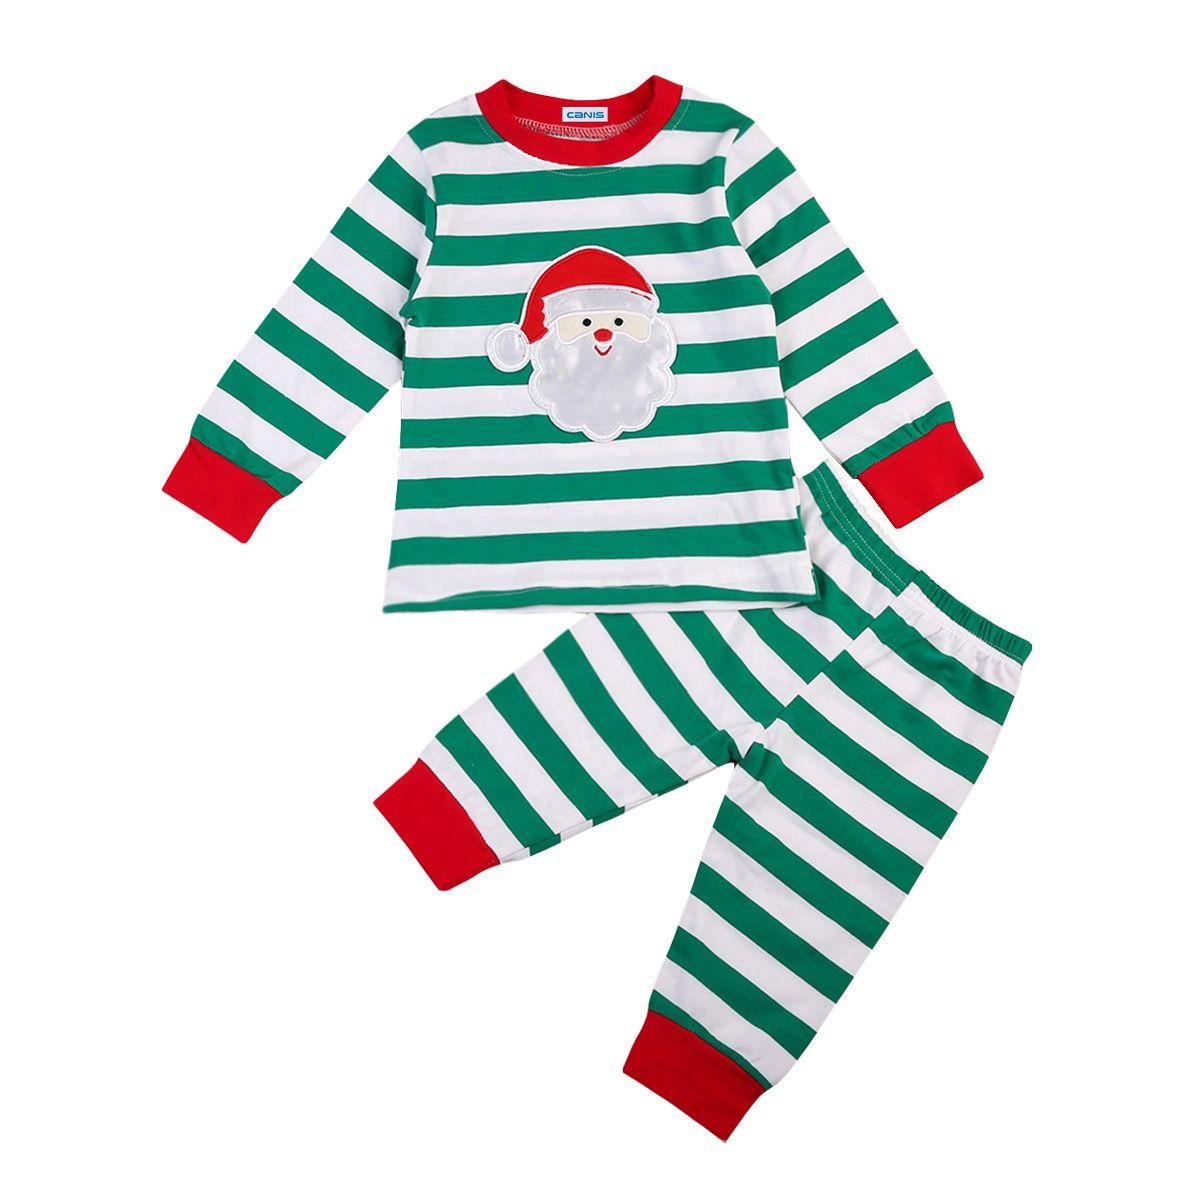 8ddc7abeb4be 2019 Christmas Kid Striped Pajamas Outfits Top+Pant Santa Kid ...